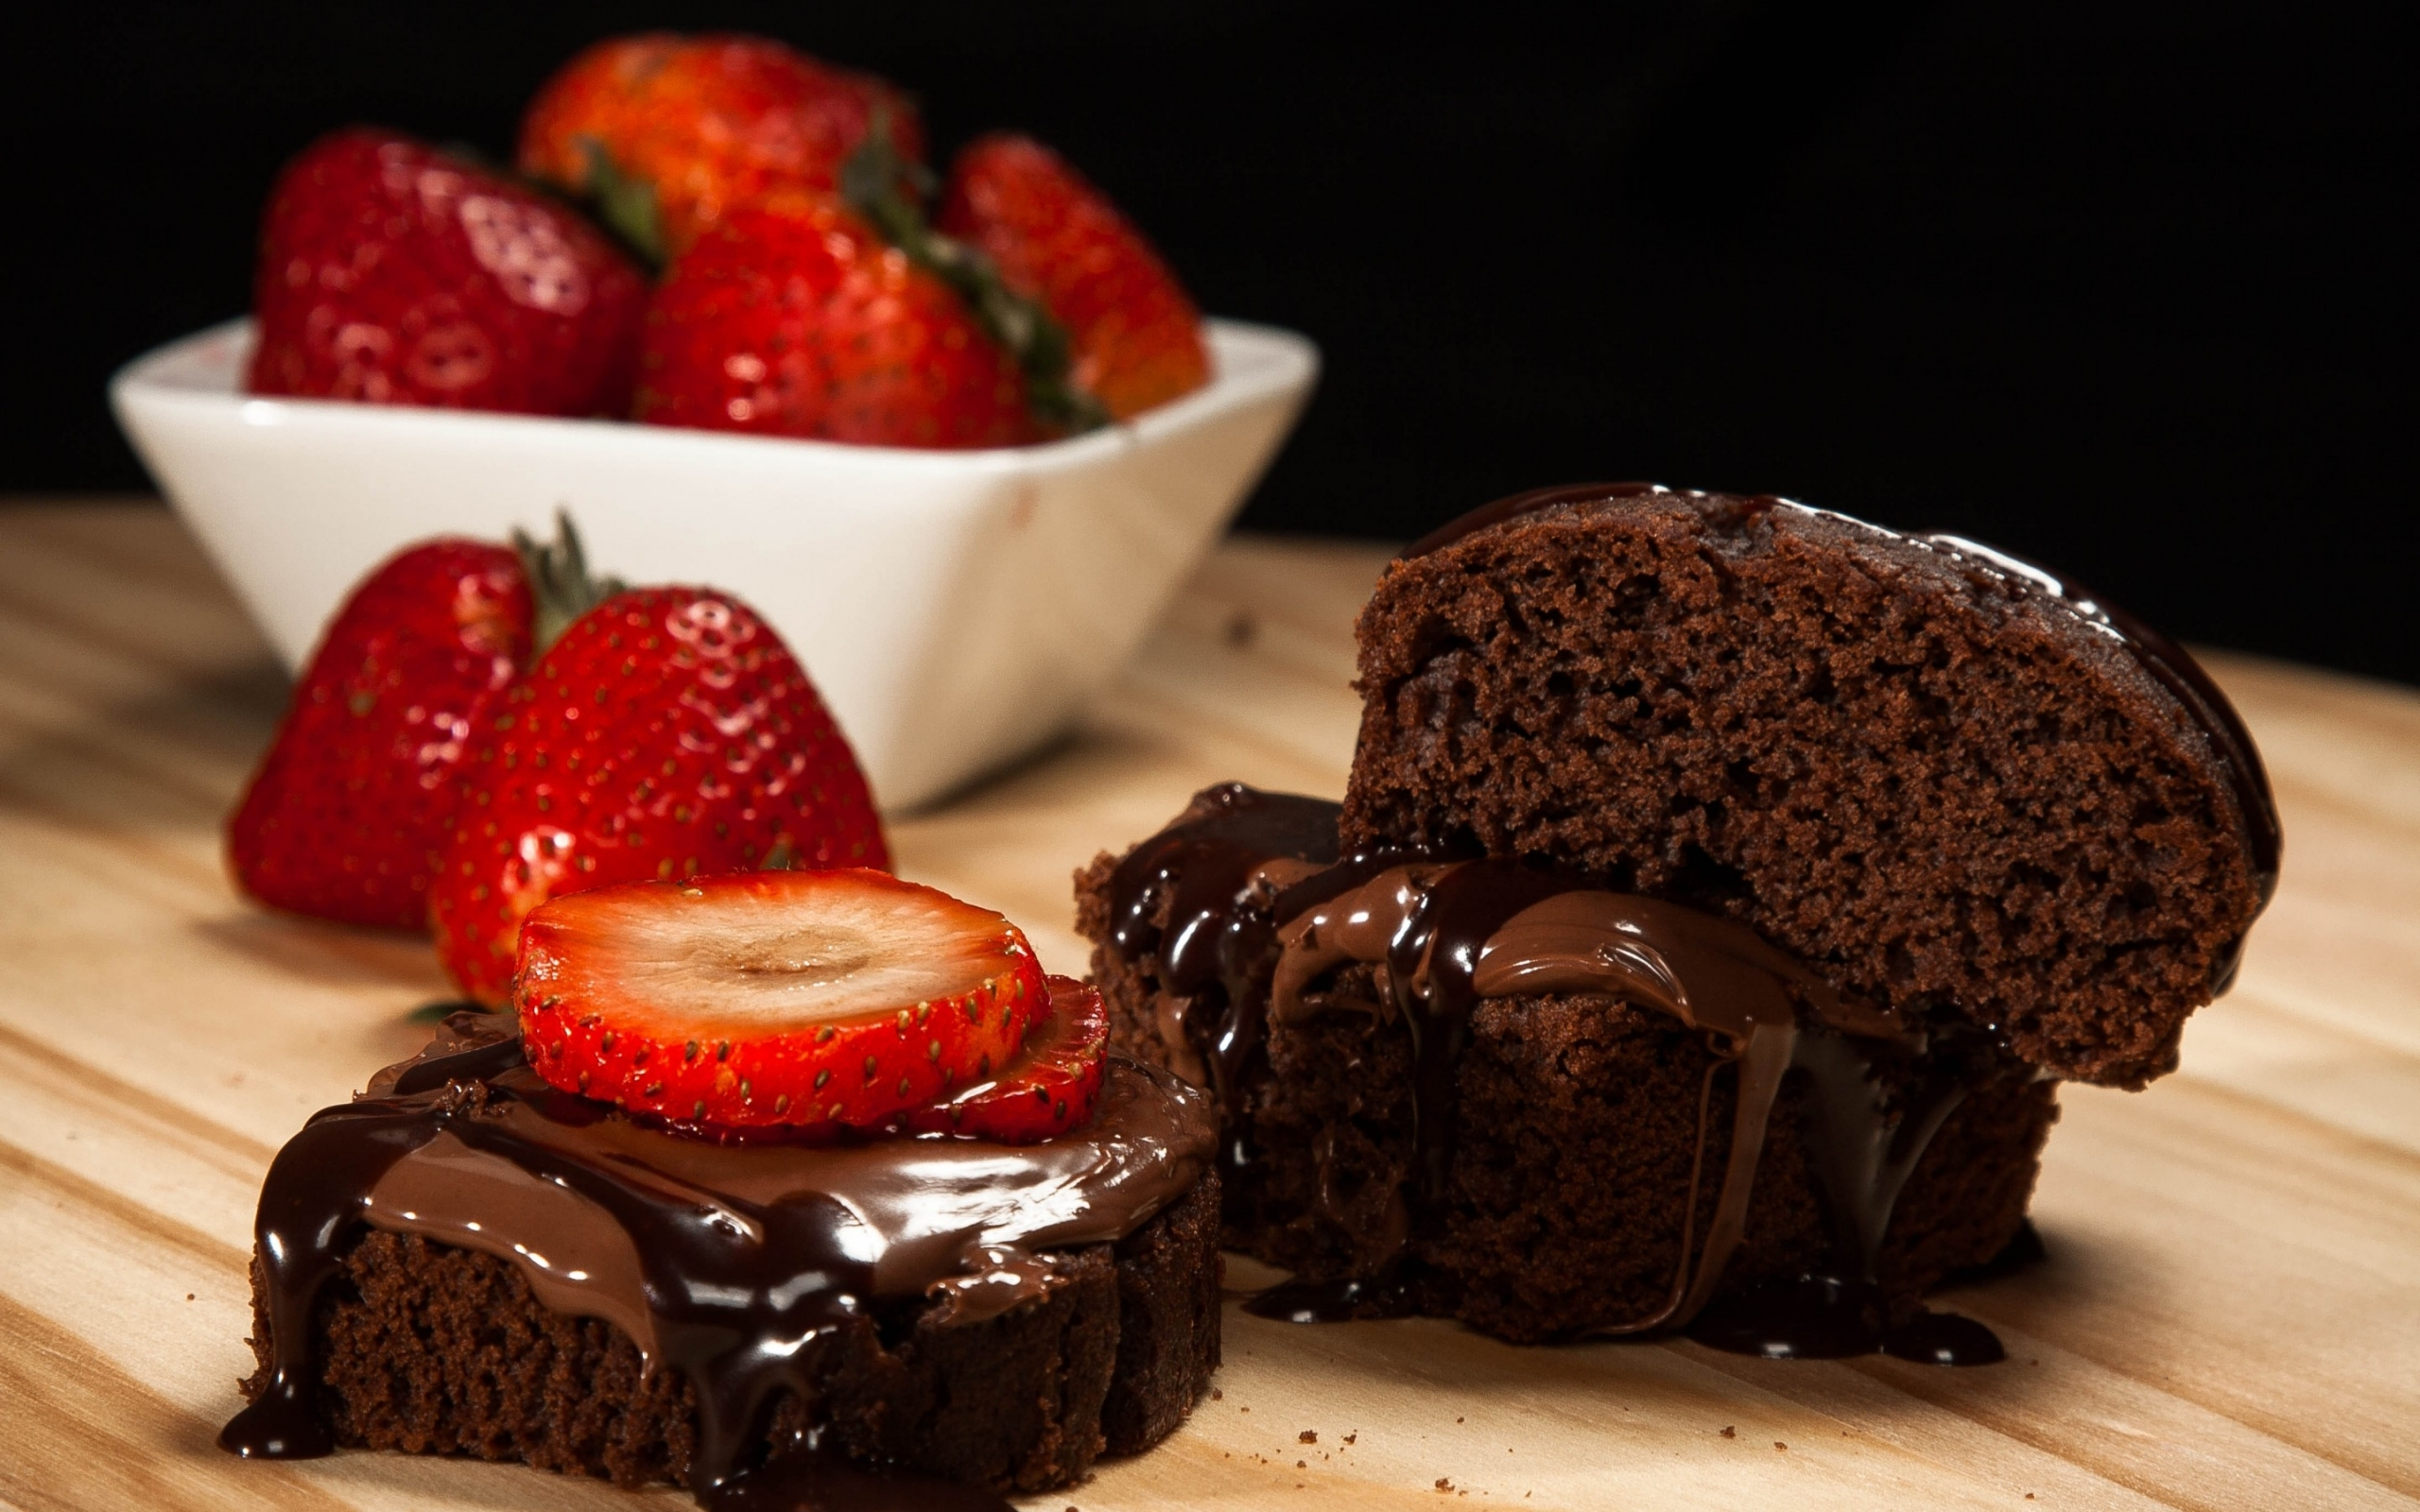 Dessert Background 40348 2560x1600 px HDWallSourcecom 2560x1600